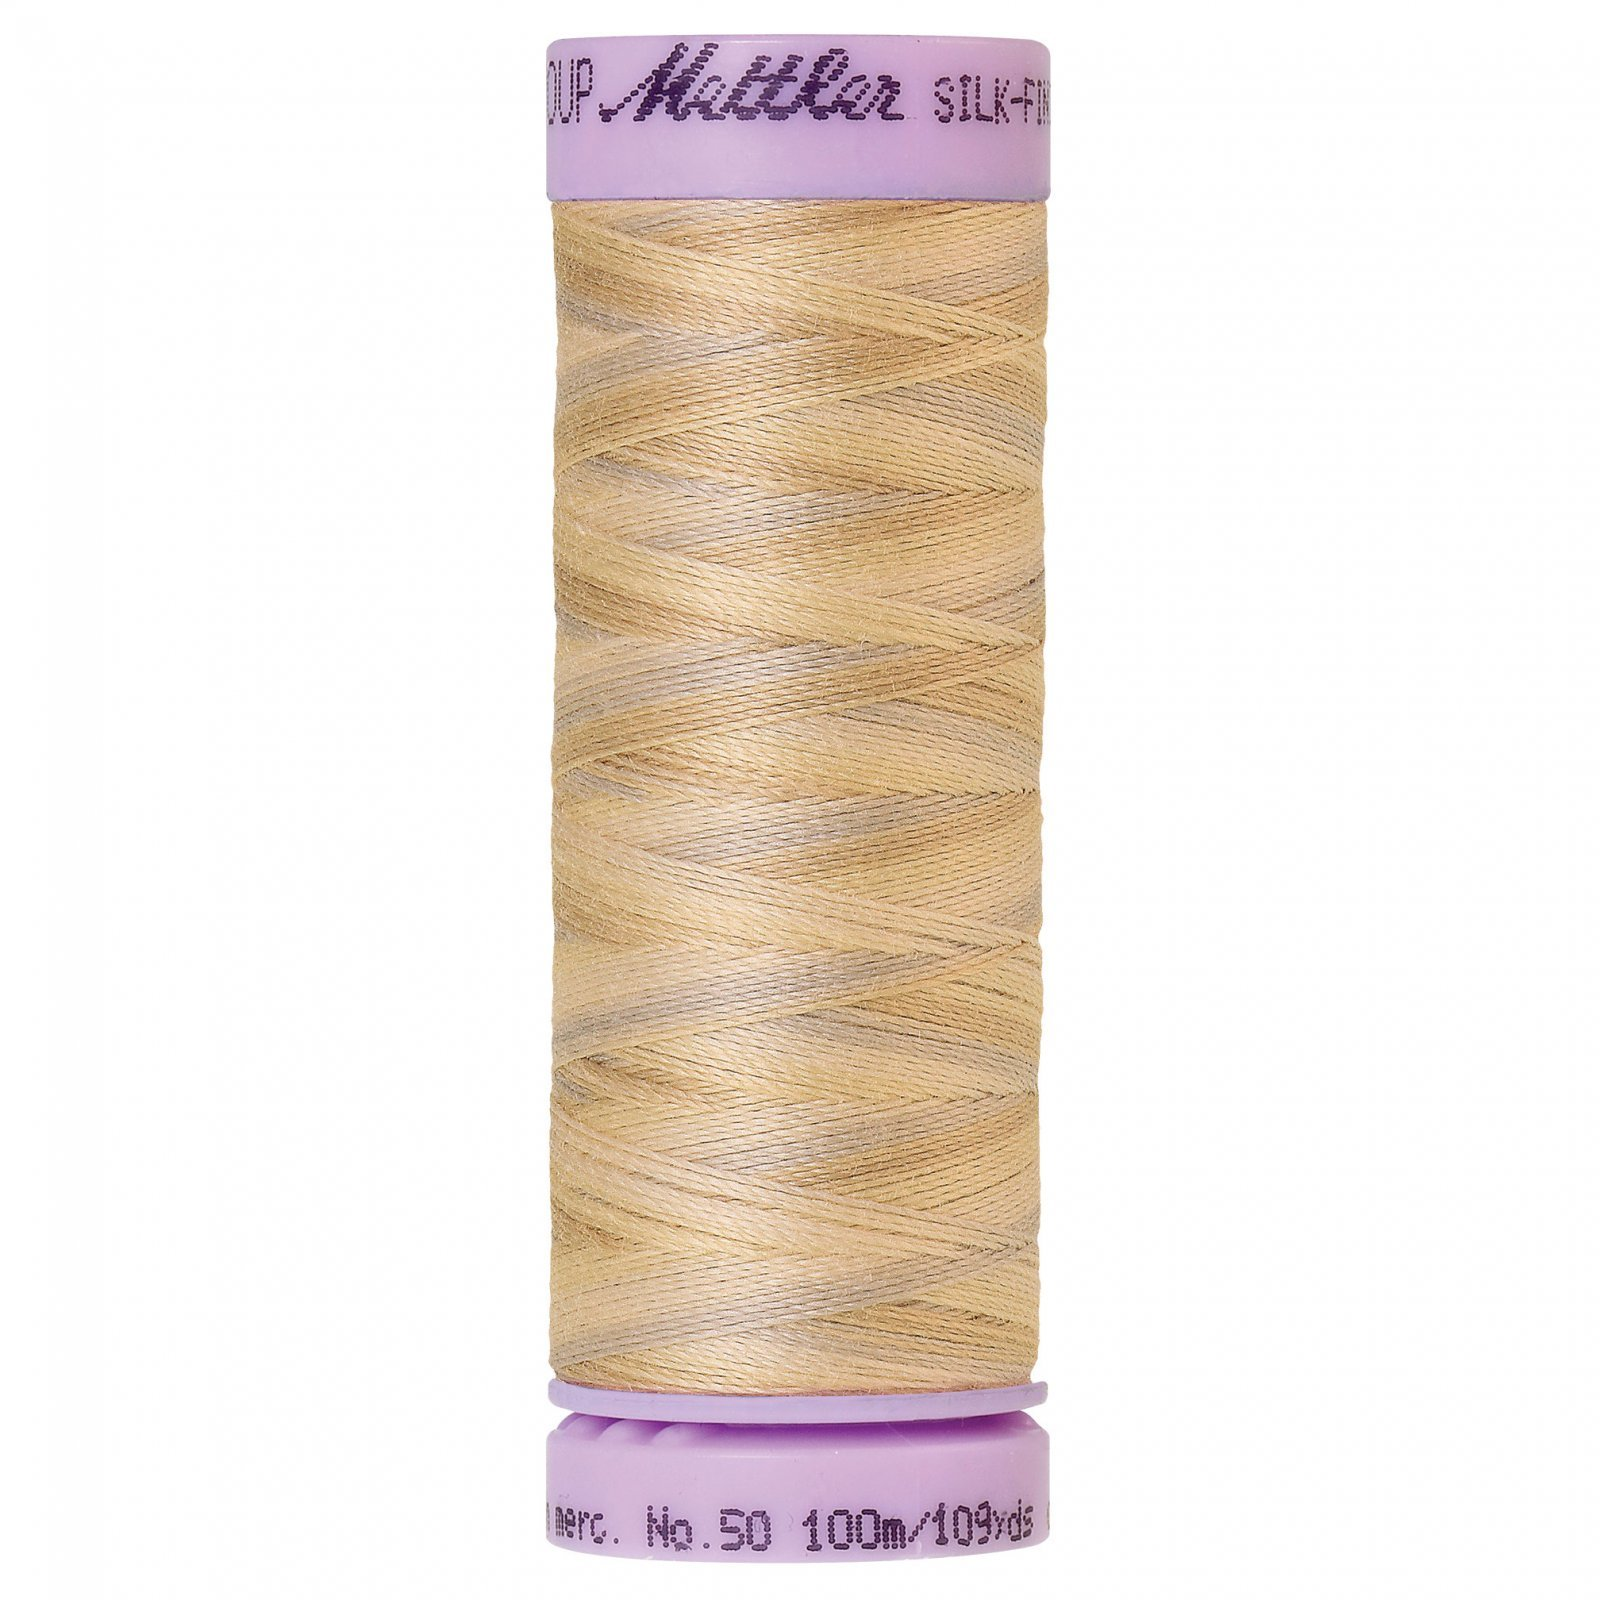 Silk Finish cotton 50wt 109 yards Pearl Tones